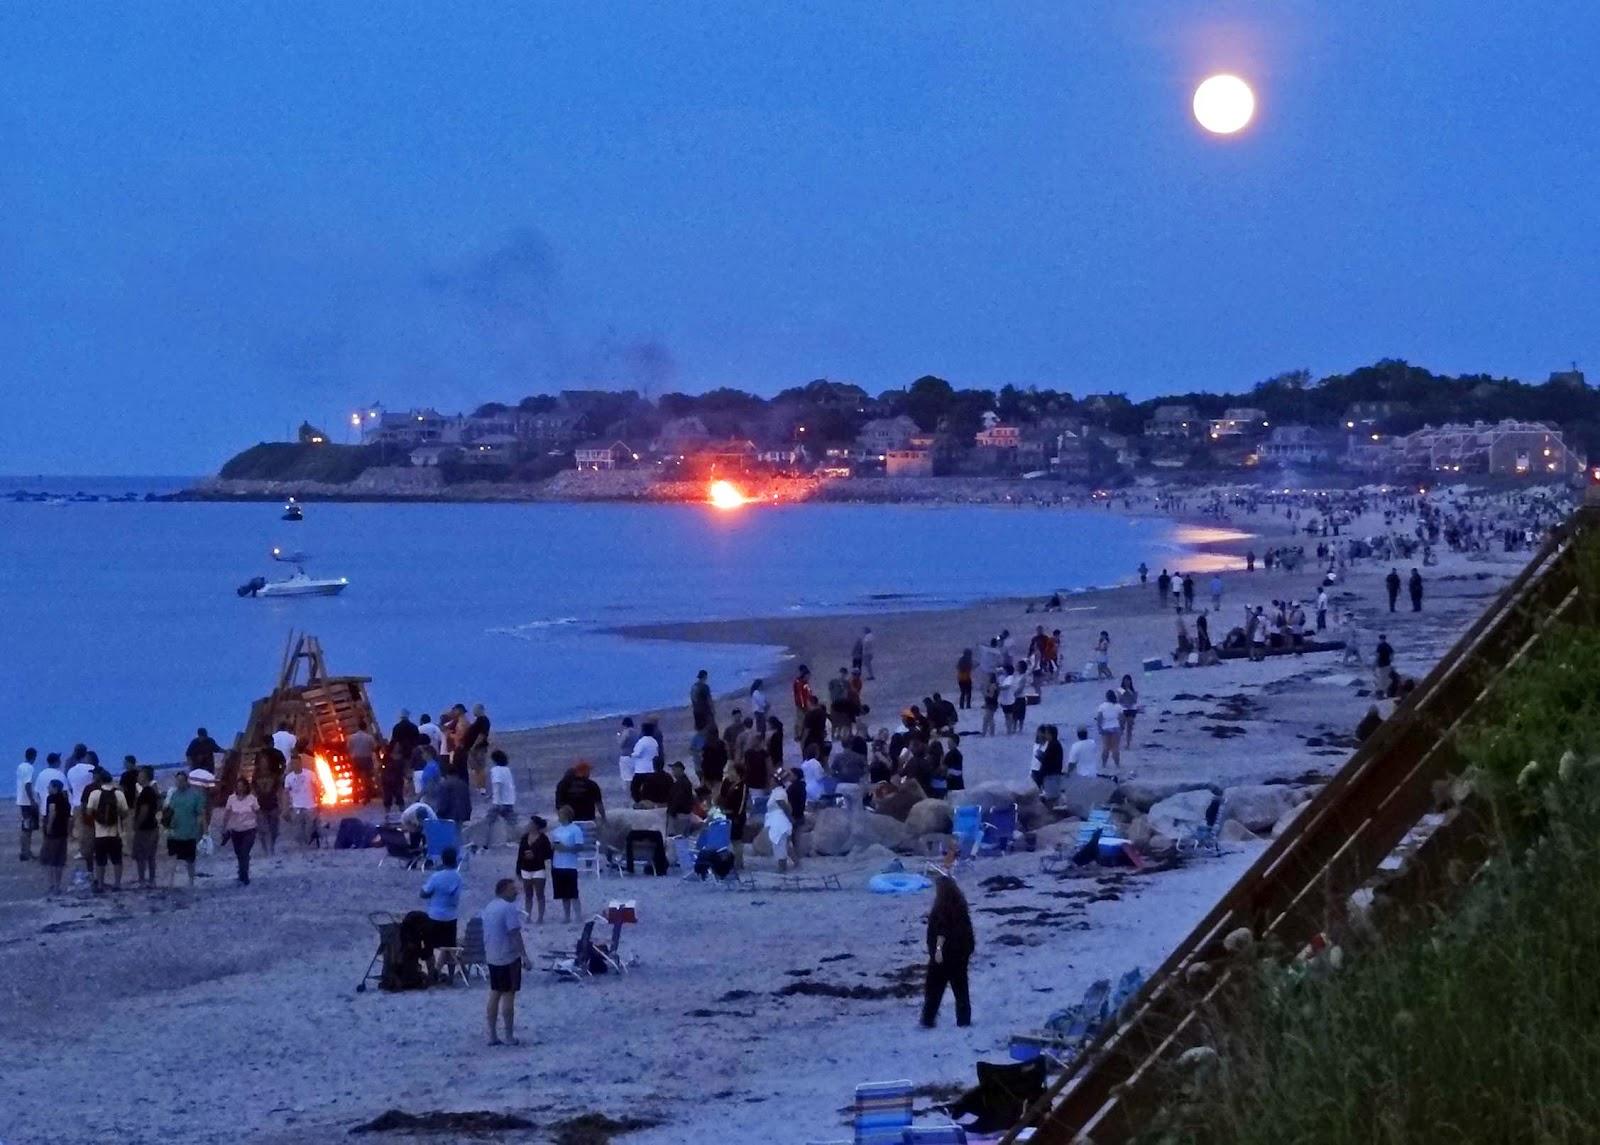 Beach Fall Wallpaper Joe S Retirement Blog Bonfires And Fireworks White Horse